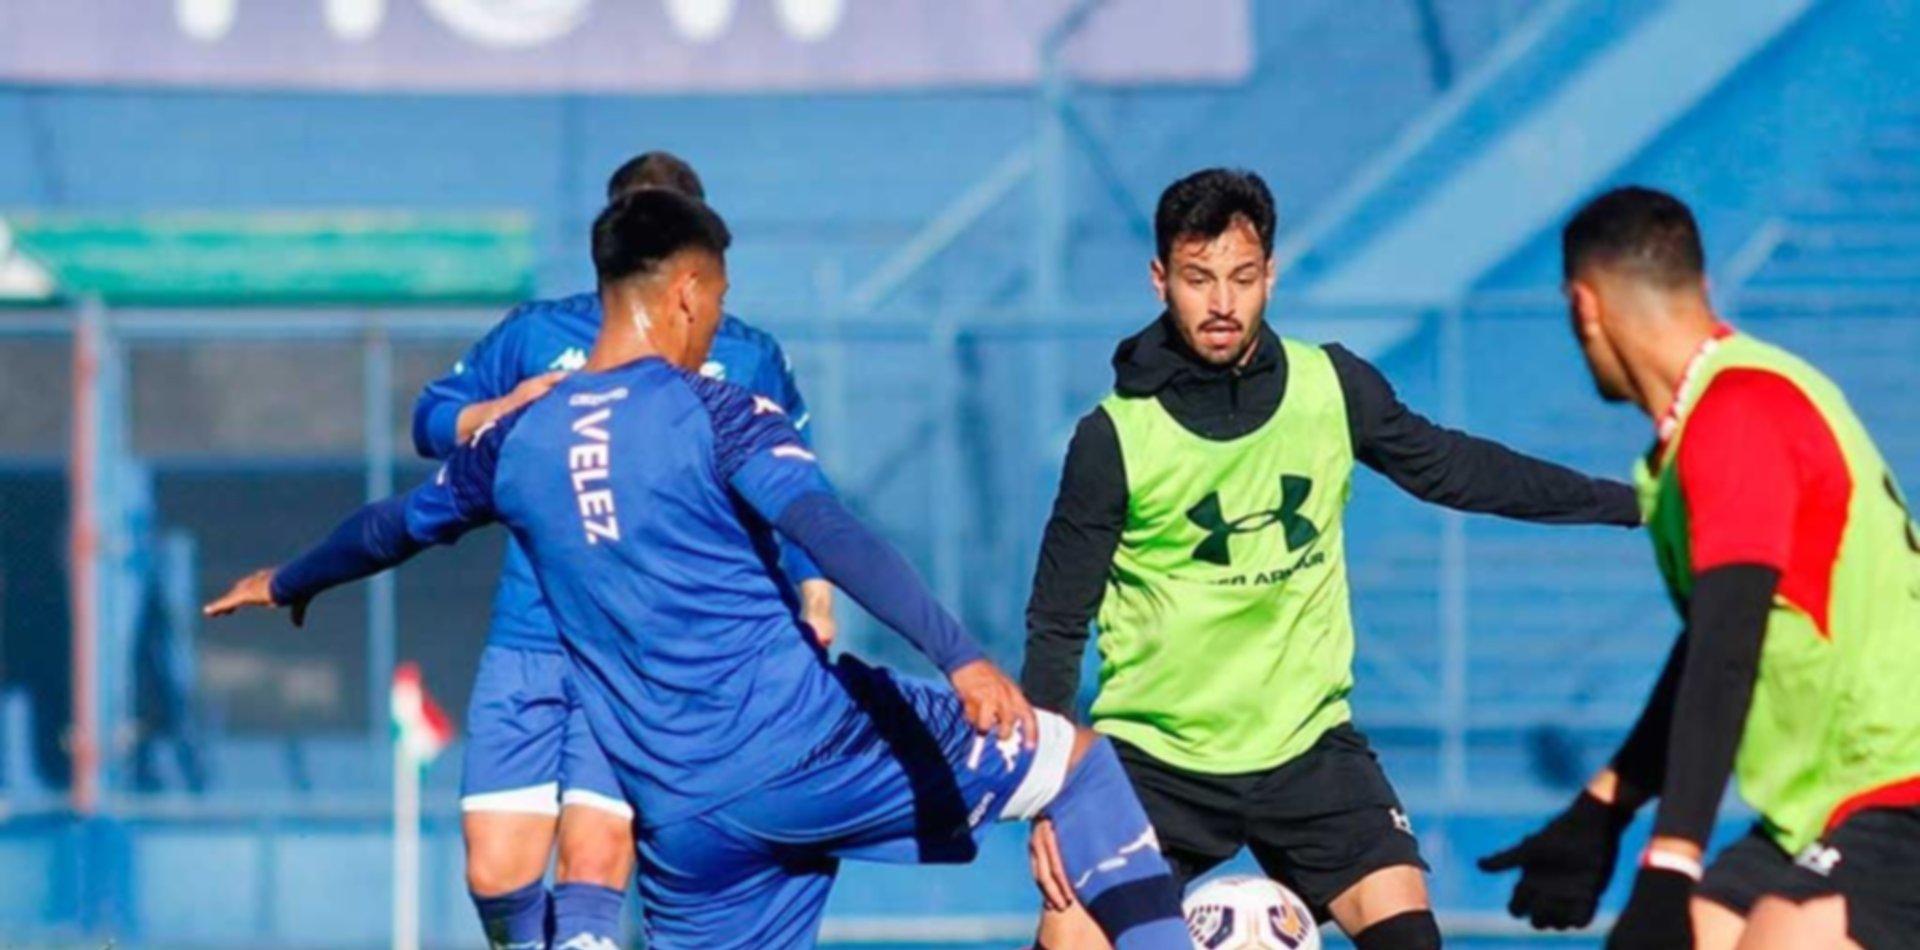 Estudiantes cayó frente a Vélez en un nuevo amistoso de pretemporada